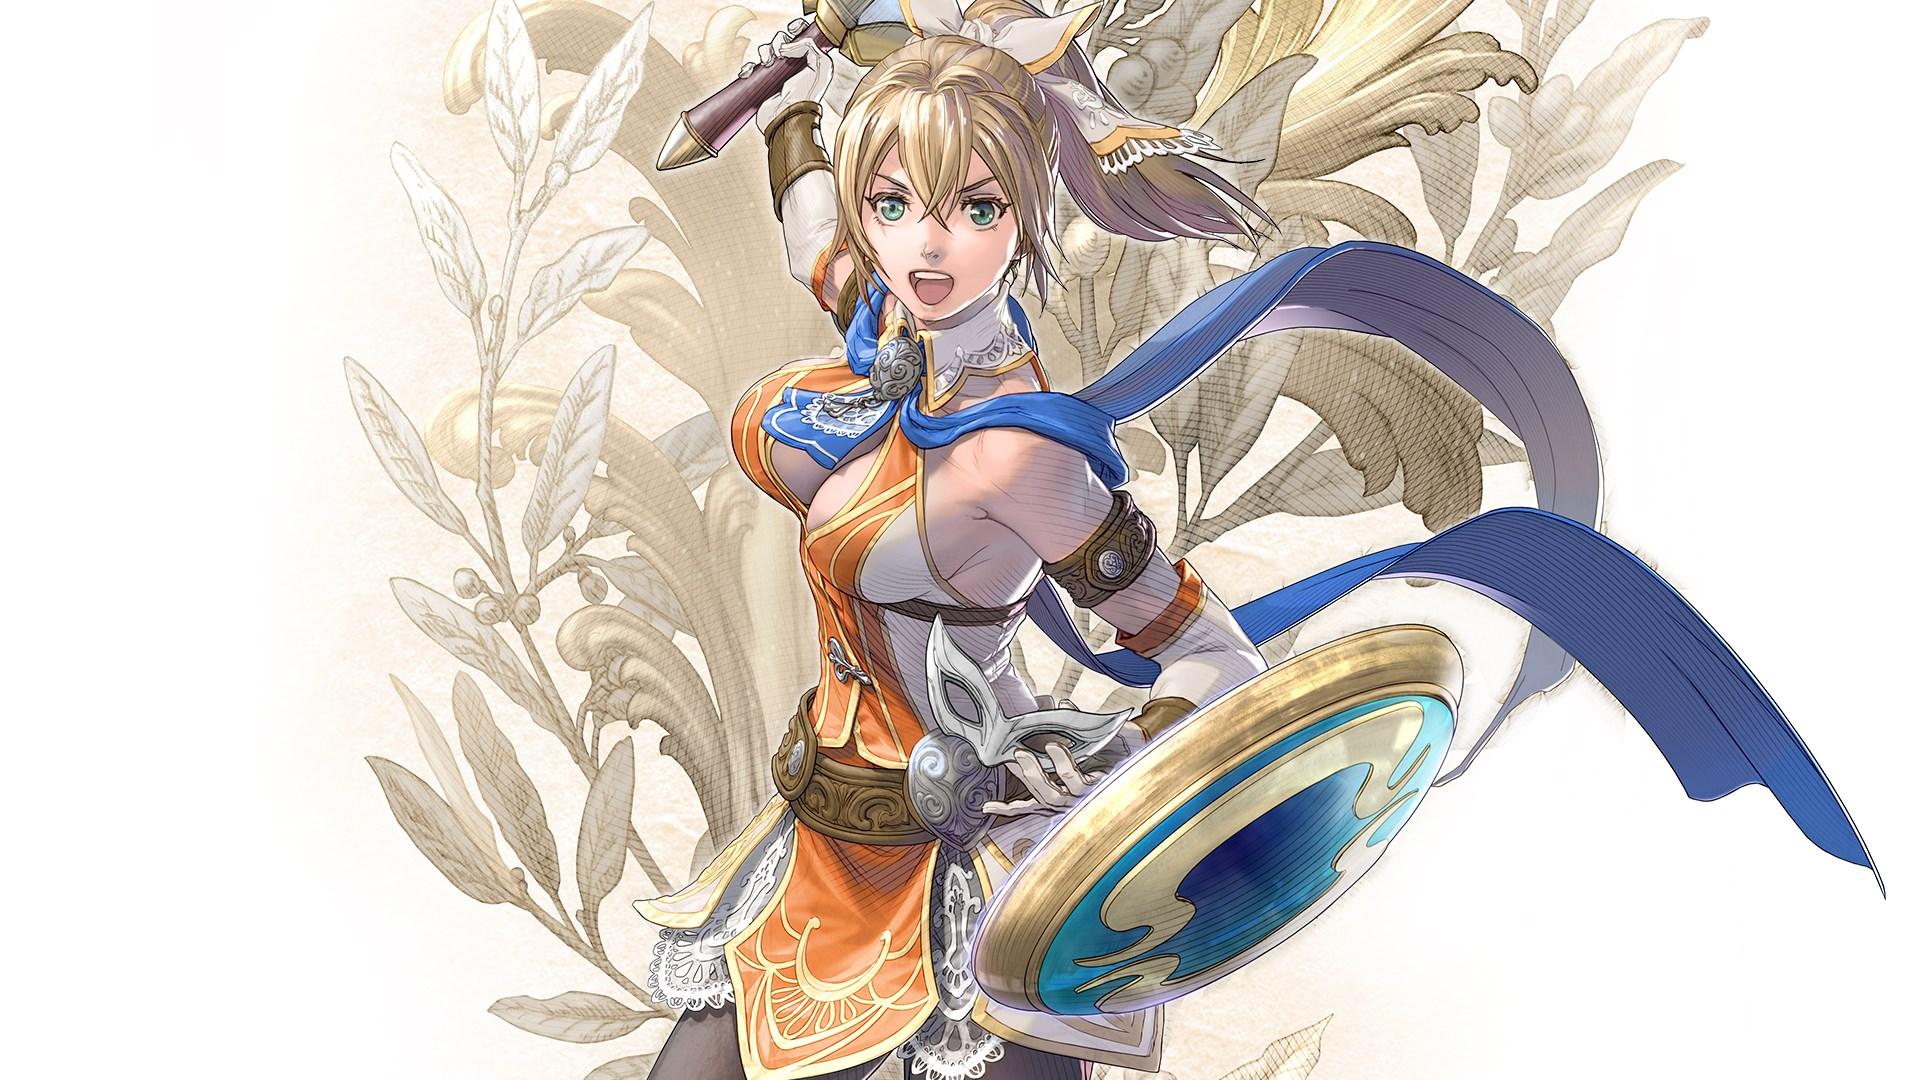 Shield-wielding Cassandra comes to SOULCALIBUR VI as Season